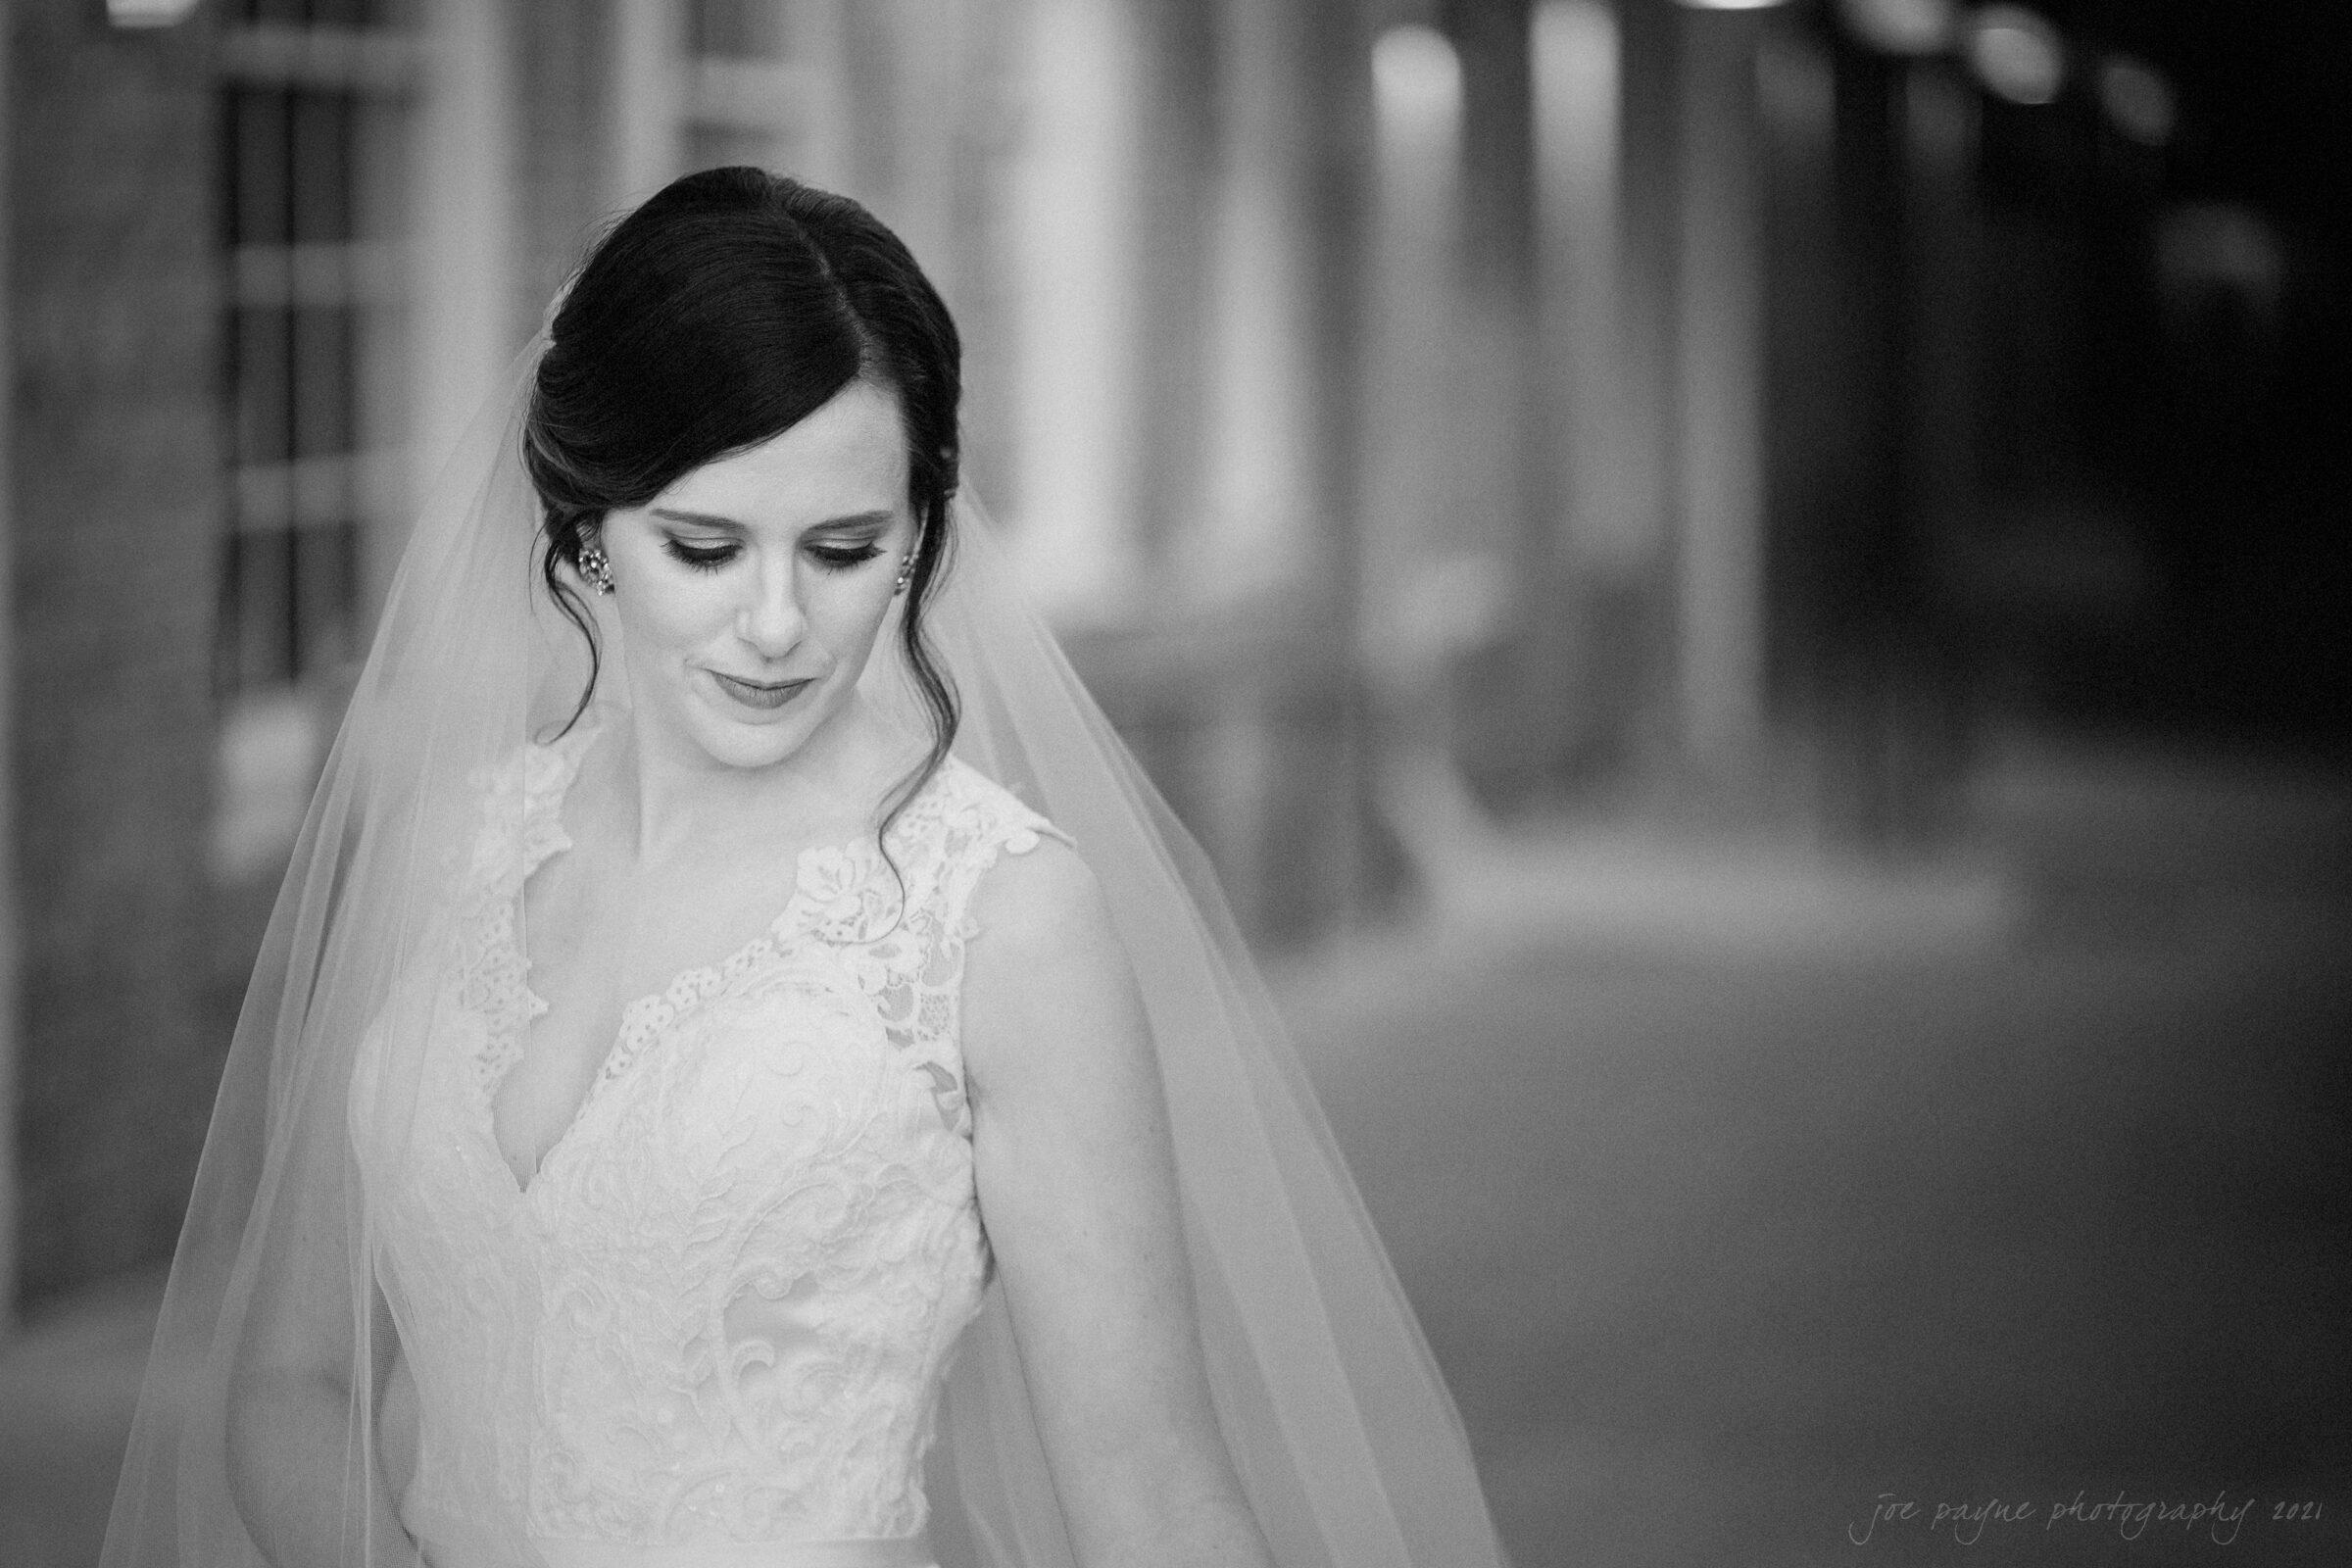 Cotton Room Wedding Photographer Kate Martin 32